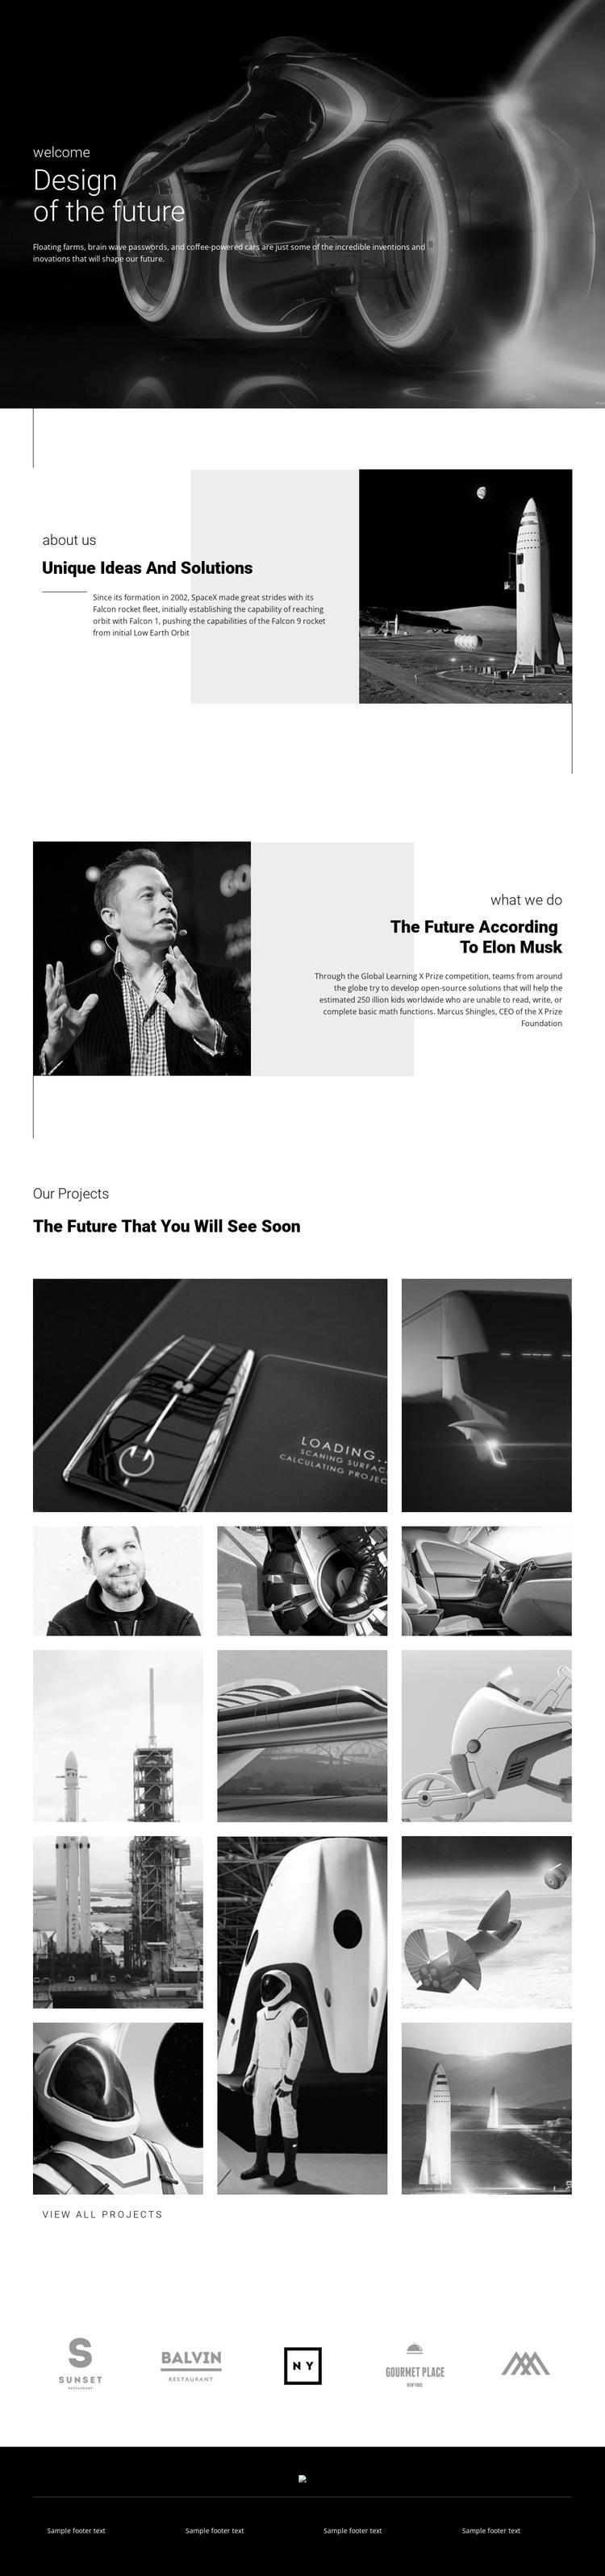 Design of future technology Joomla Page Builder